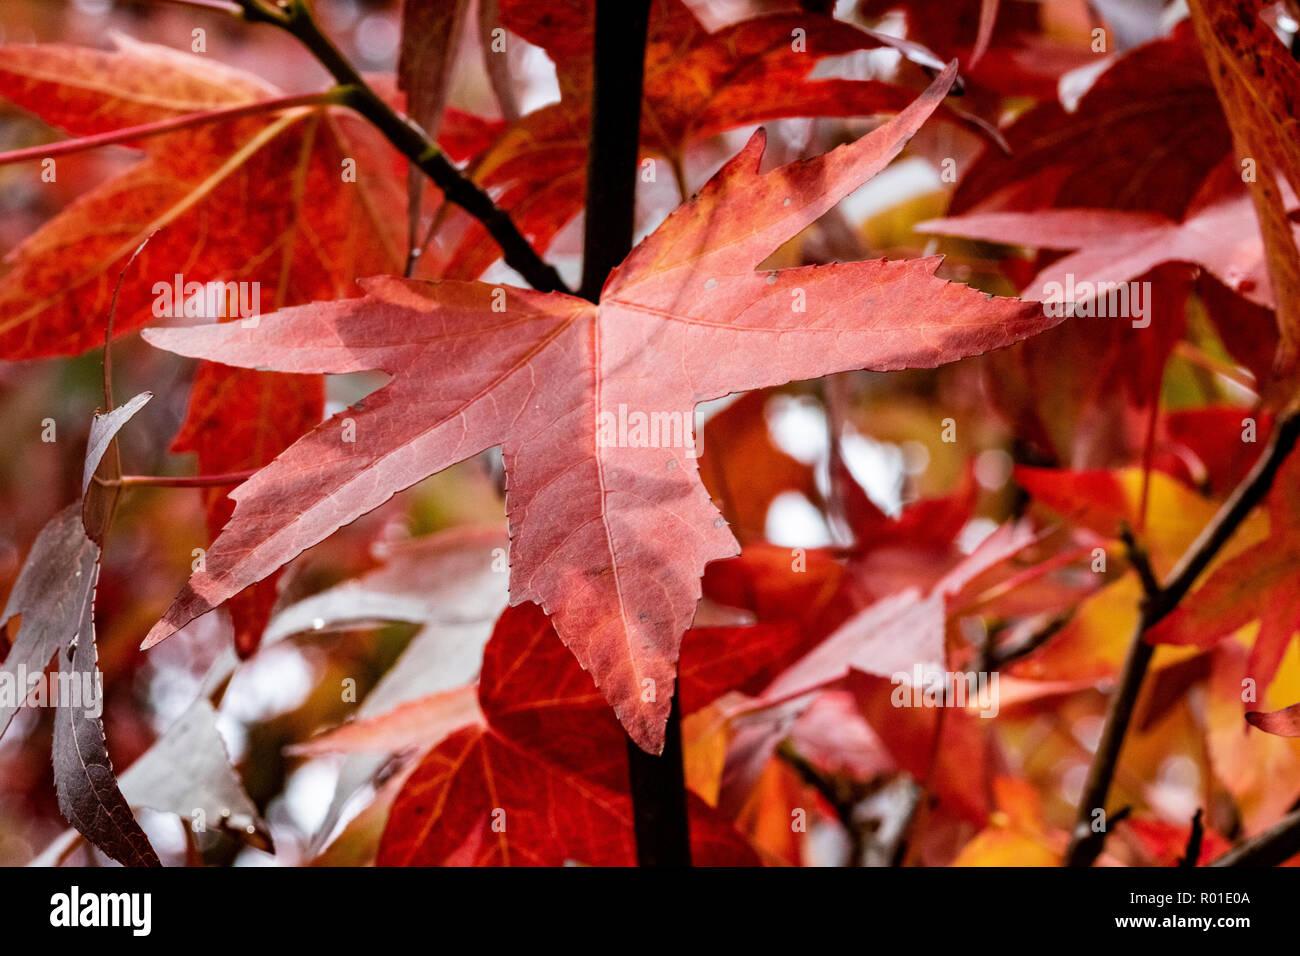 Colourful Red Autumn Leaves #1, Great Torrington, Devon, England. Stock Photo